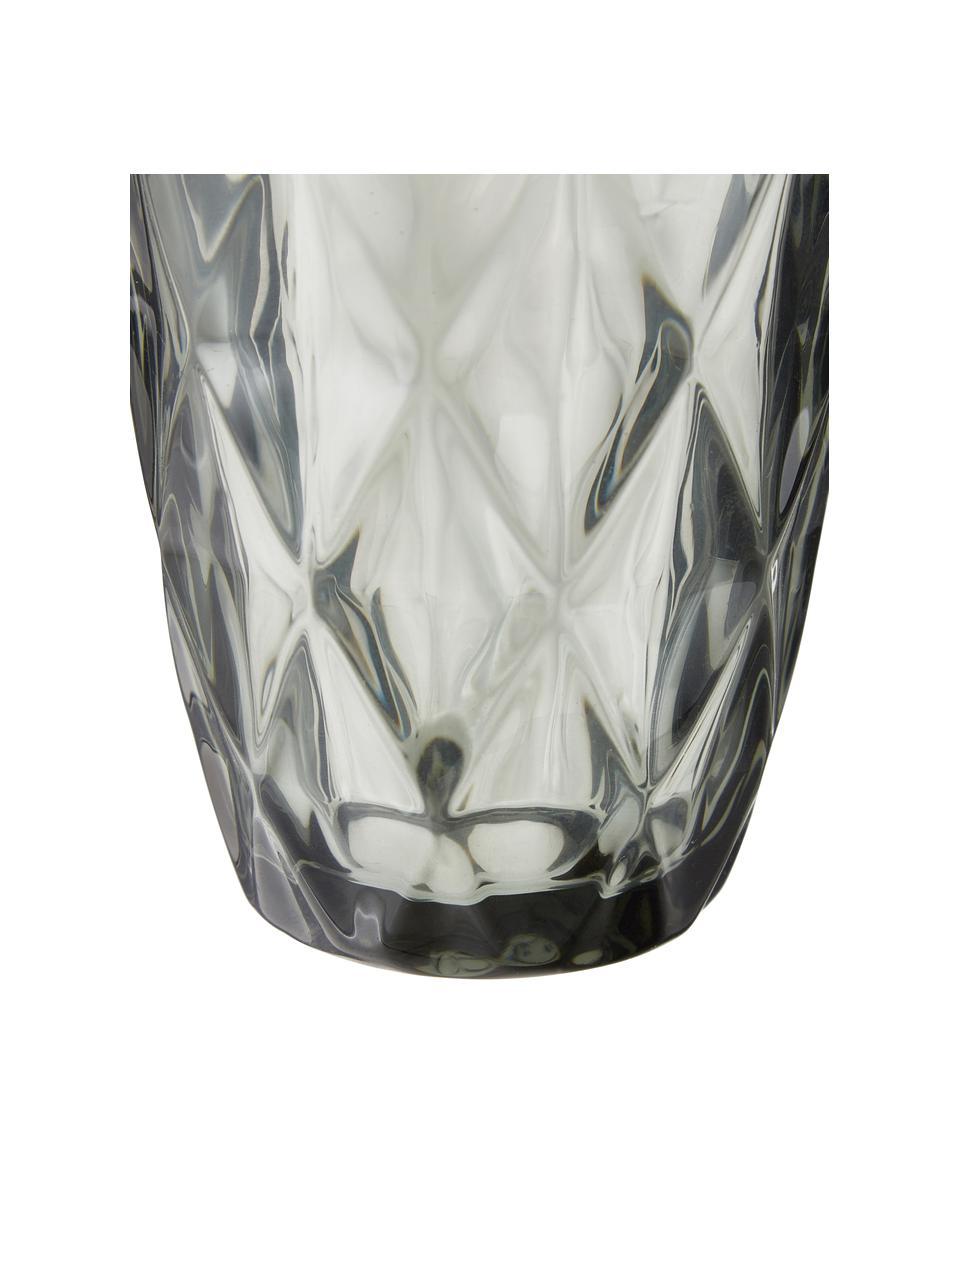 Bicchiere acqua con motivo a rilievo Colorado 4 pz, Vetro, Grigio trasparente, Ø 8 x Alt. 10 cm